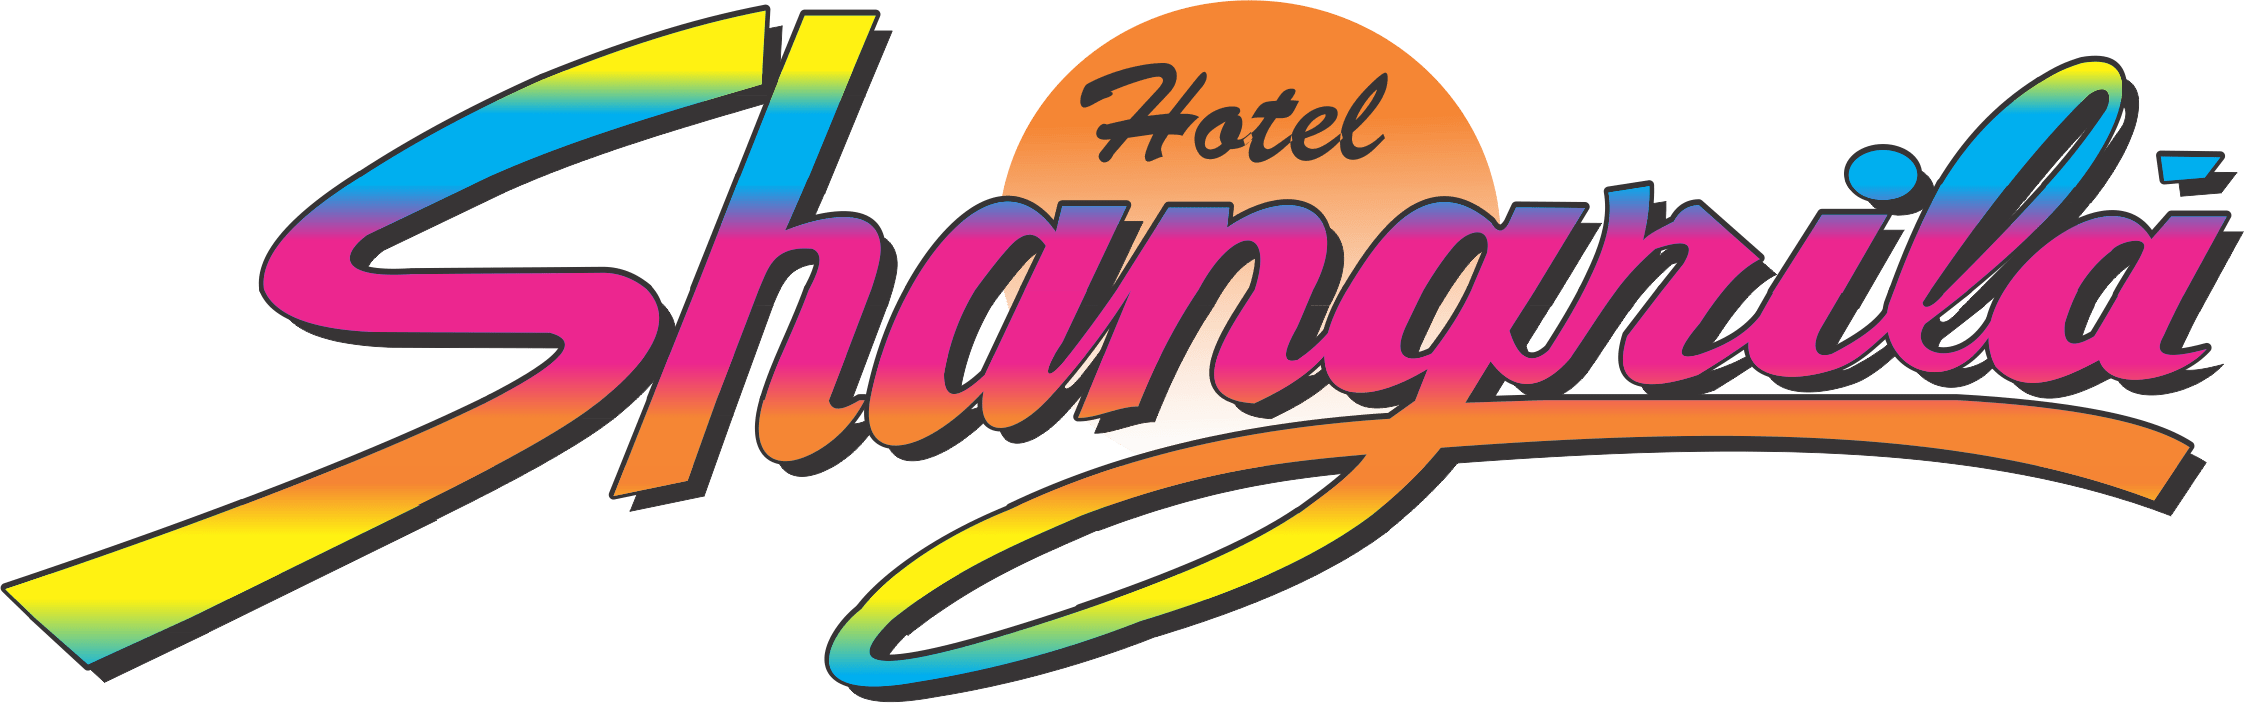 Shangrila Logo 1